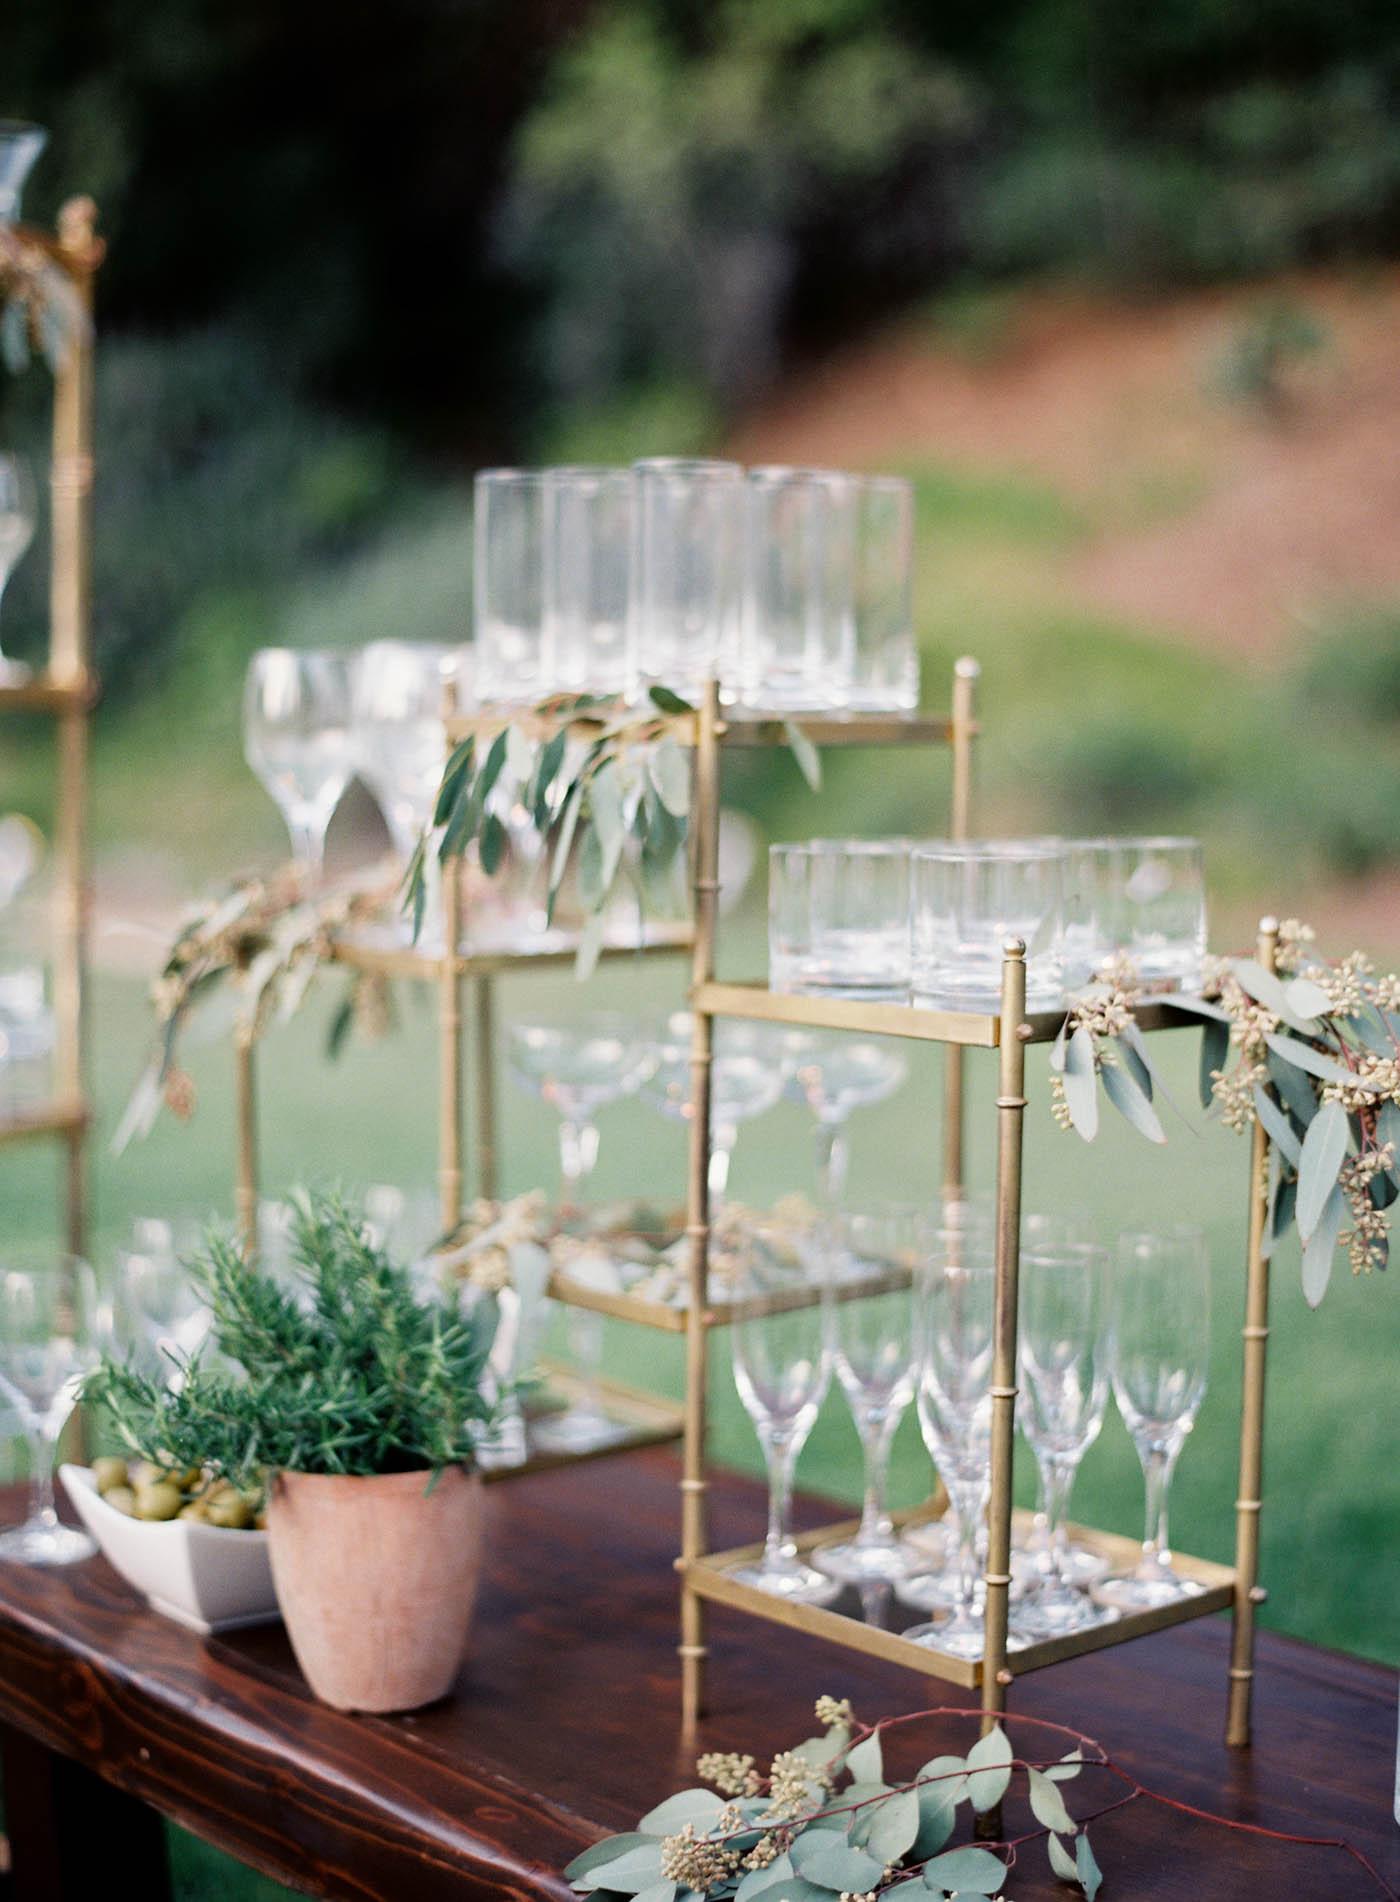 ojai-valley-inn-summer-wedding-jen-huang-40.jpg